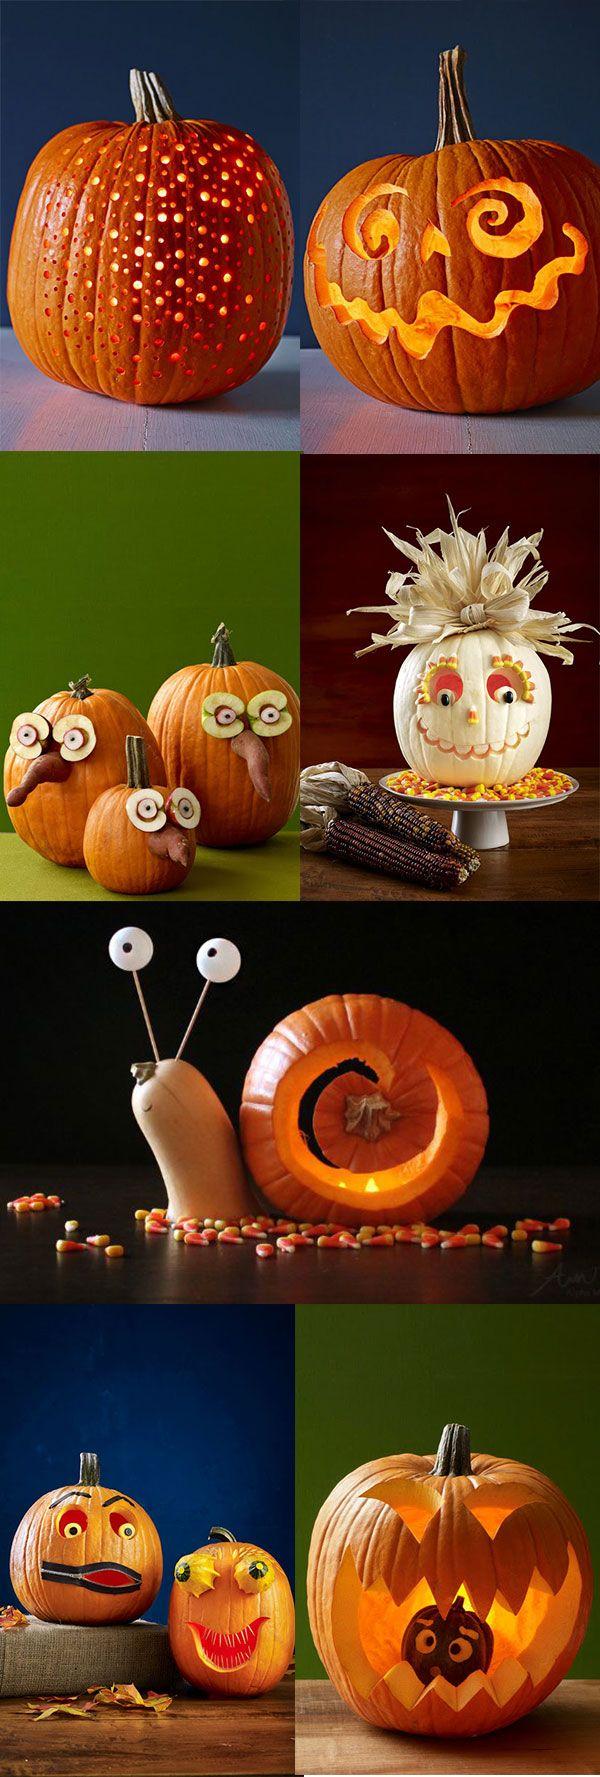 Spooky Halloween Decorating Ideas Spooky halloween